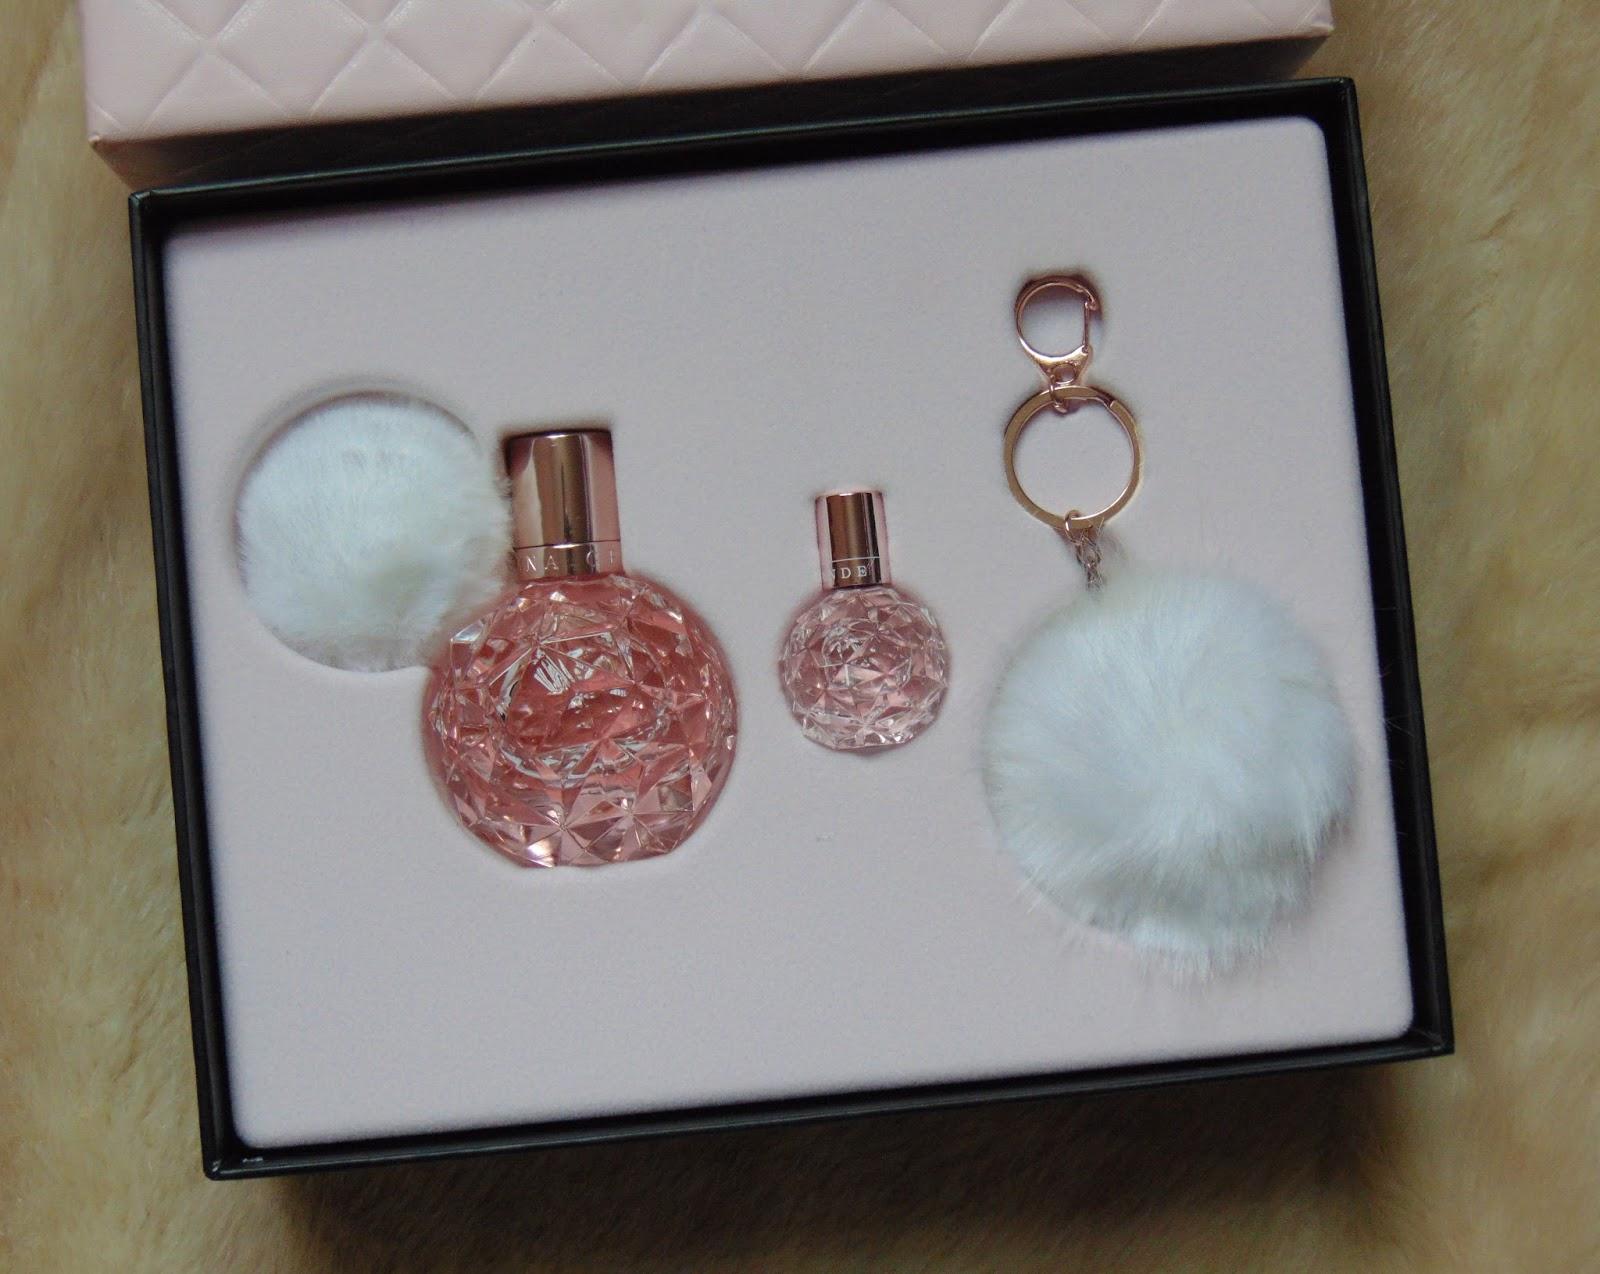 S Ariana Grande Perfume Gift Set Viva Glam